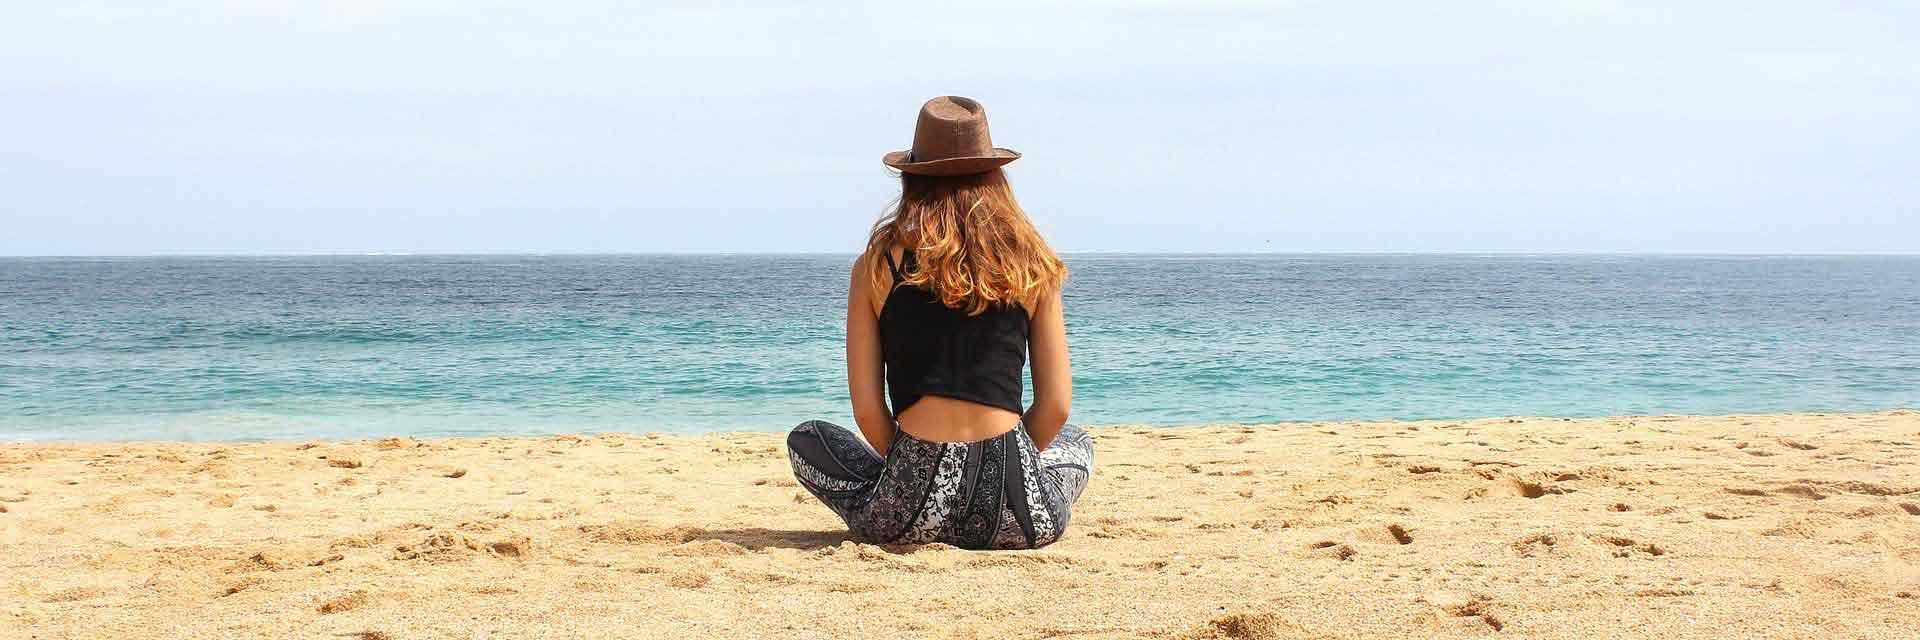 Yoga Titelbild Strand